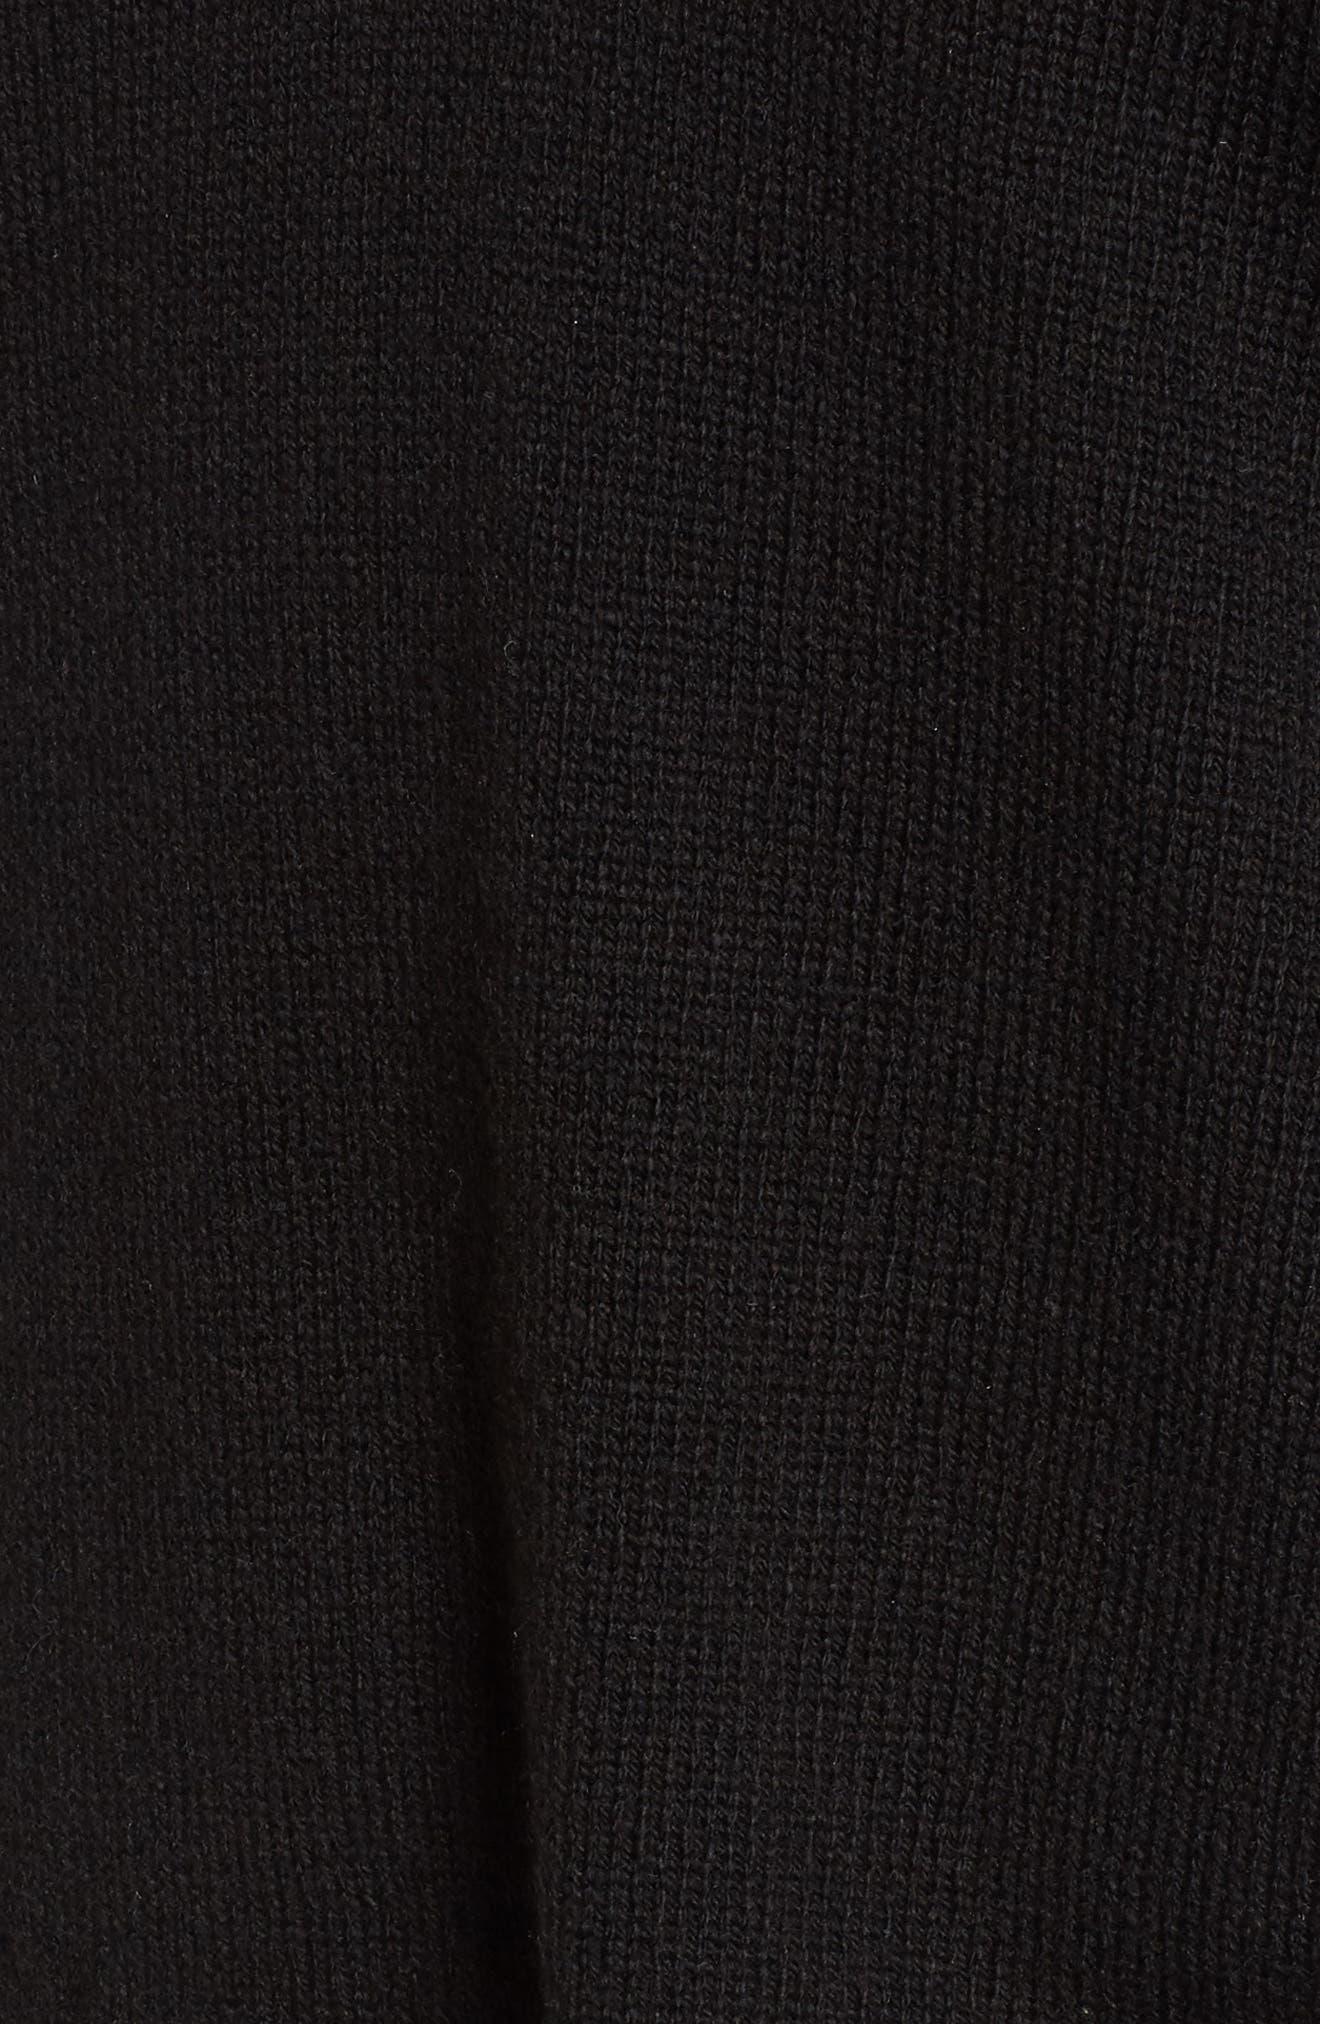 Cutout Neck Pullover,                             Alternate thumbnail 5, color,                             001